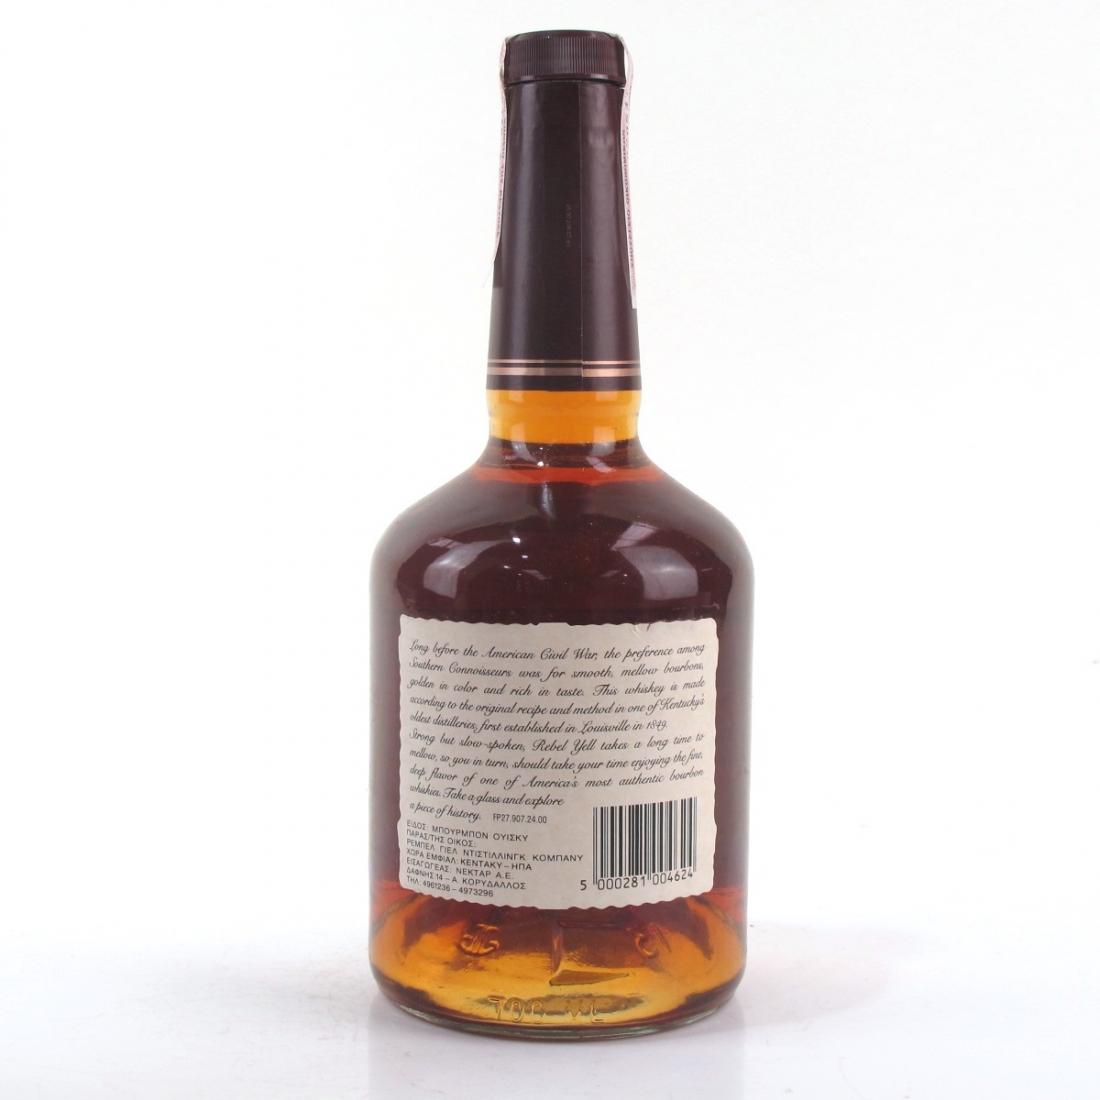 Rebel Yell Kentucky Straight Bourbon